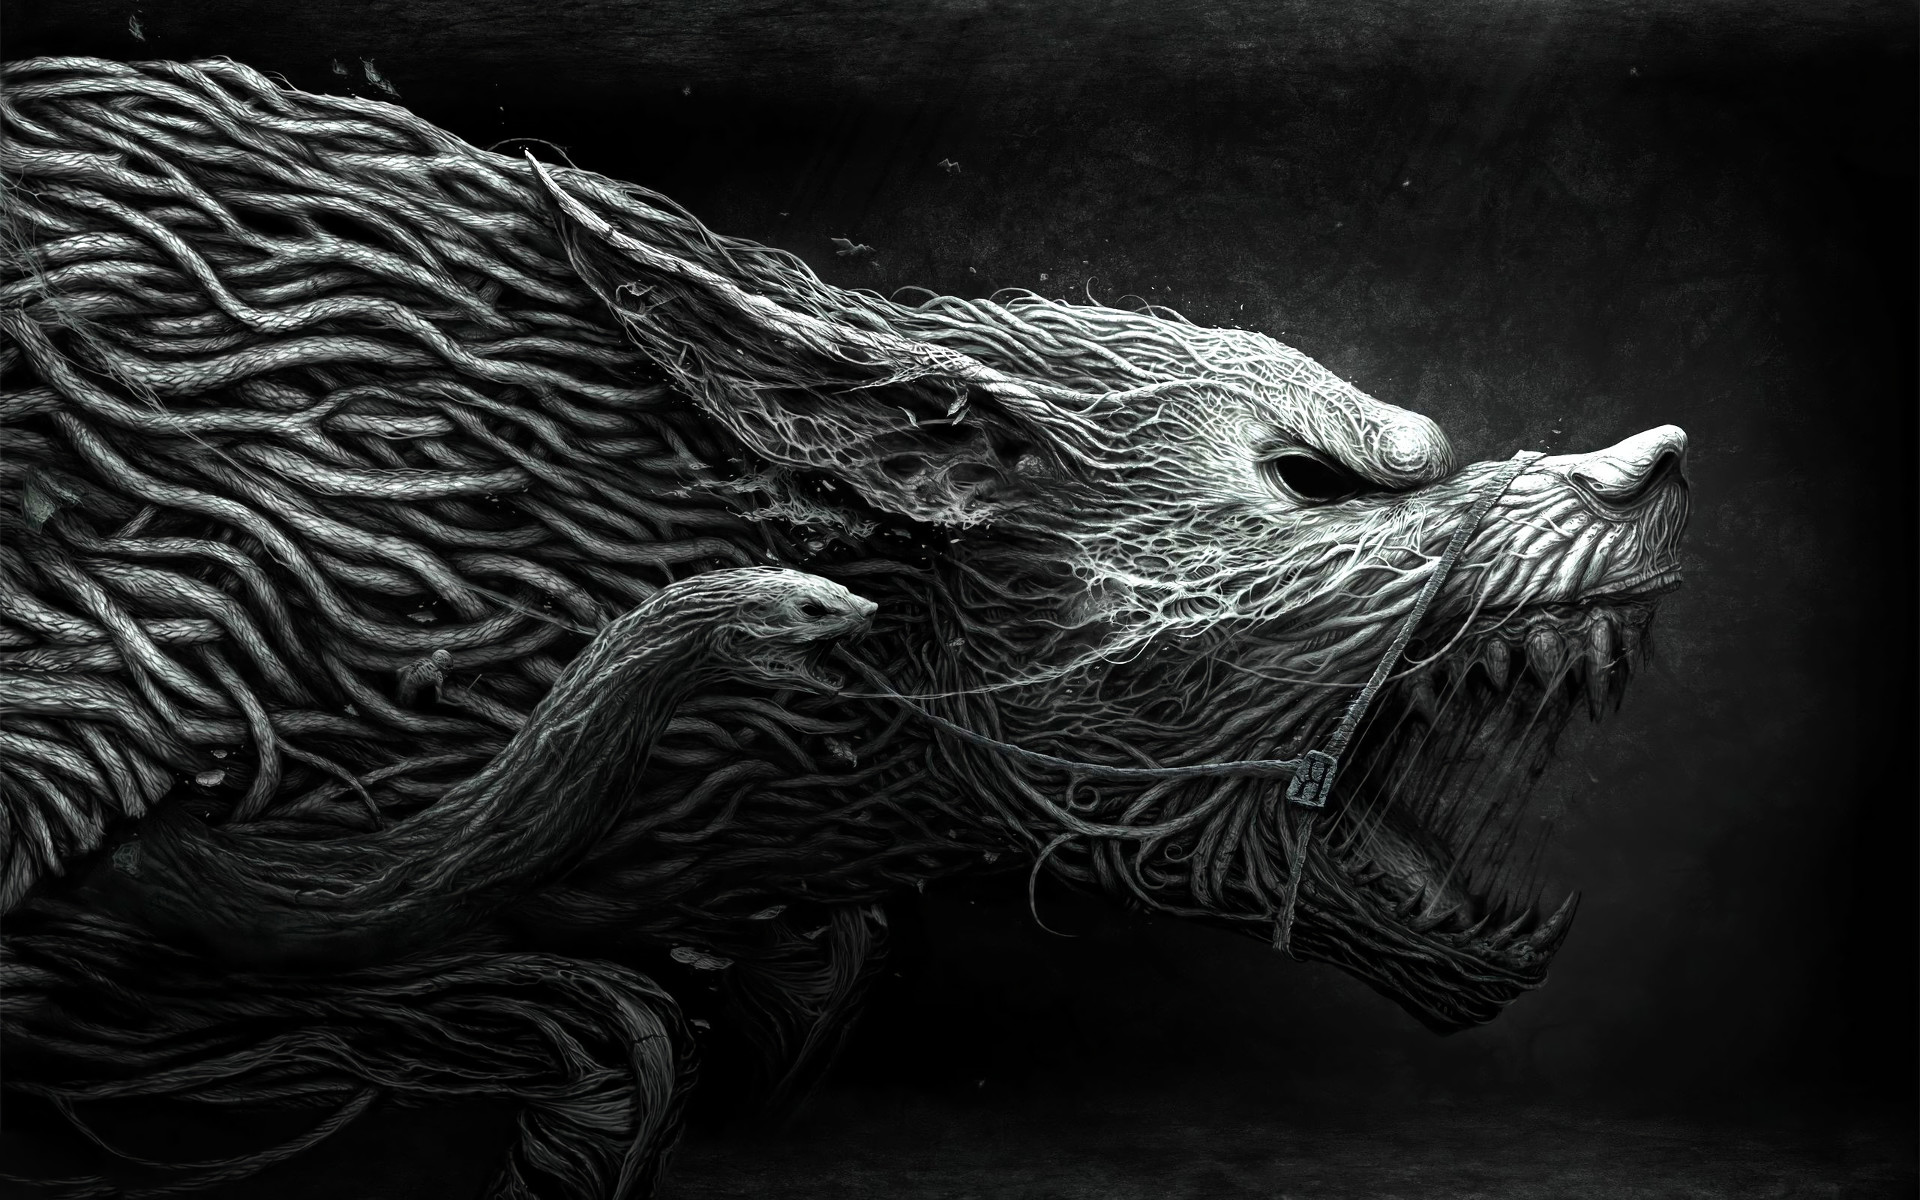 Dark – Werewolf Dark Animal Fantasy Creature Snake Black Creepy Wallpaper